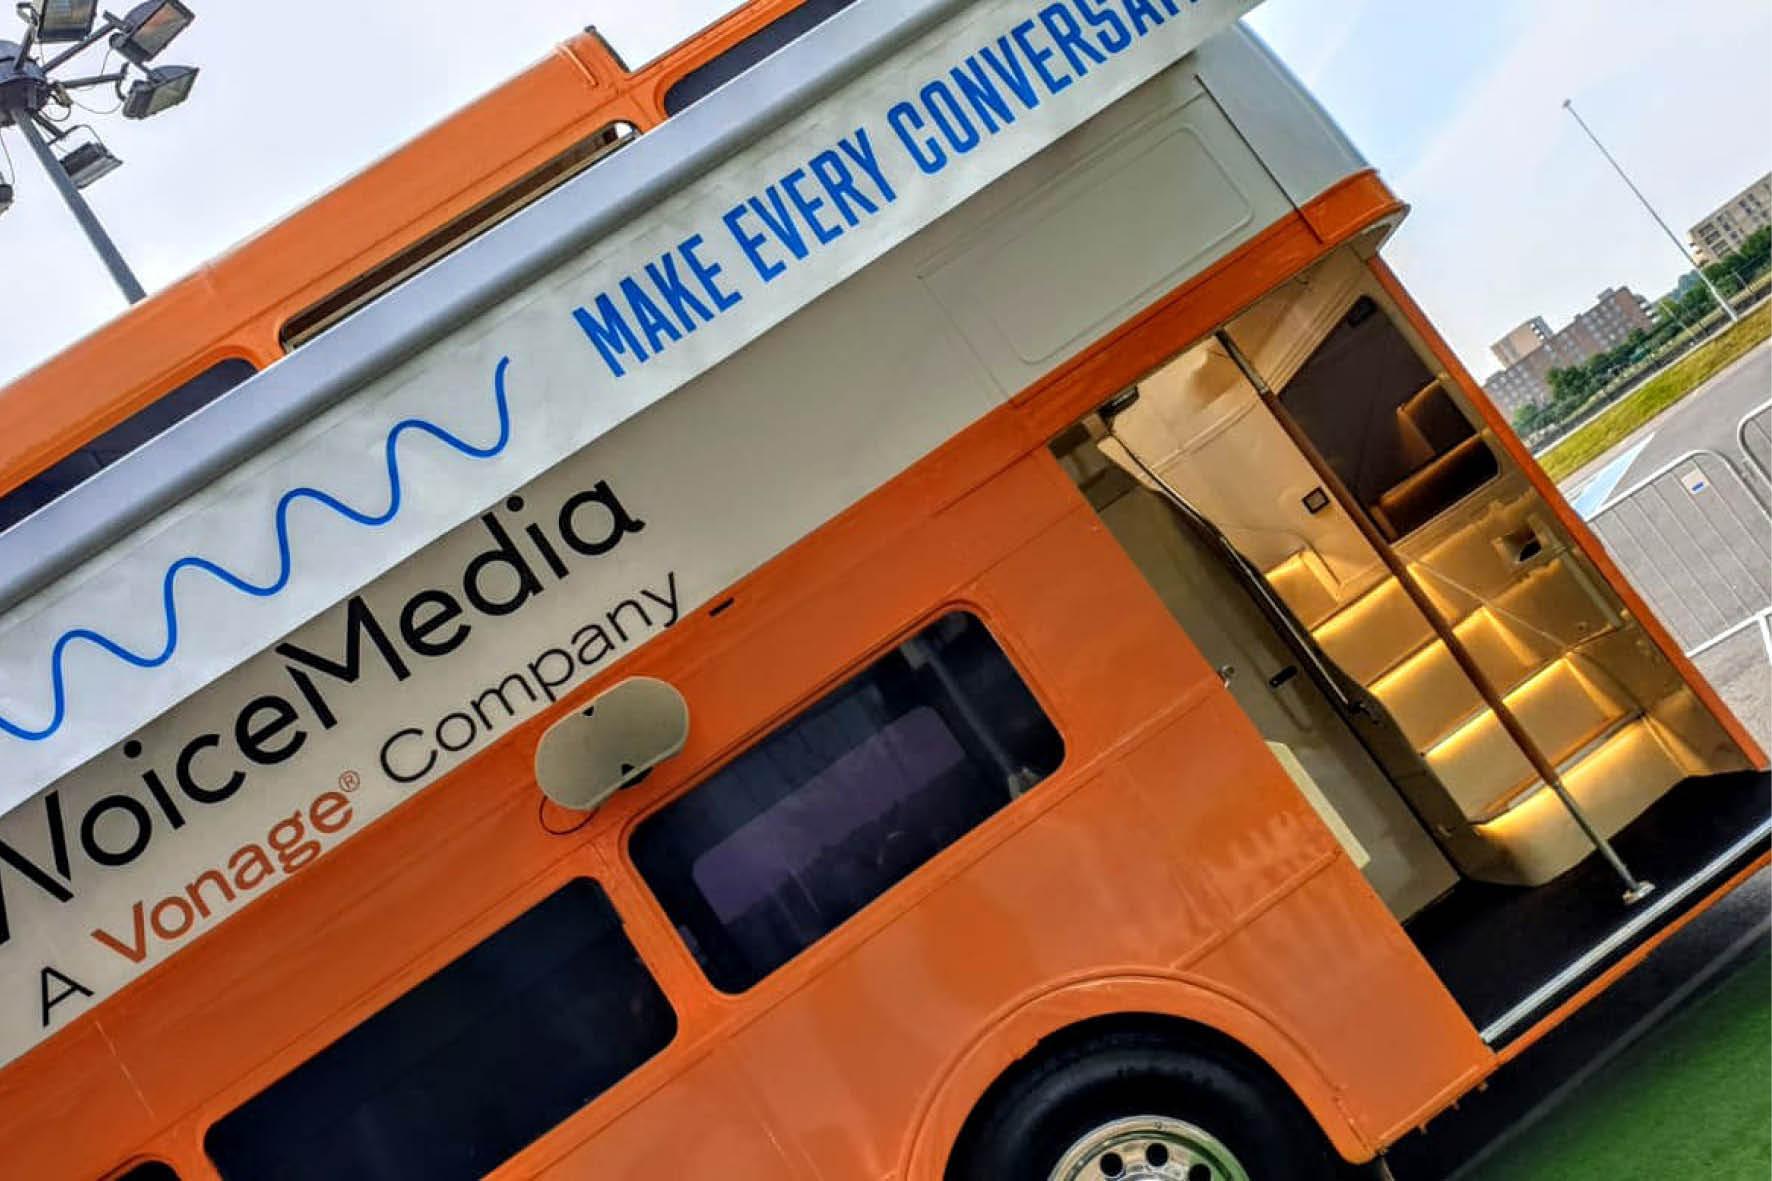 bus_business_2019_new_voice_media2.jpg